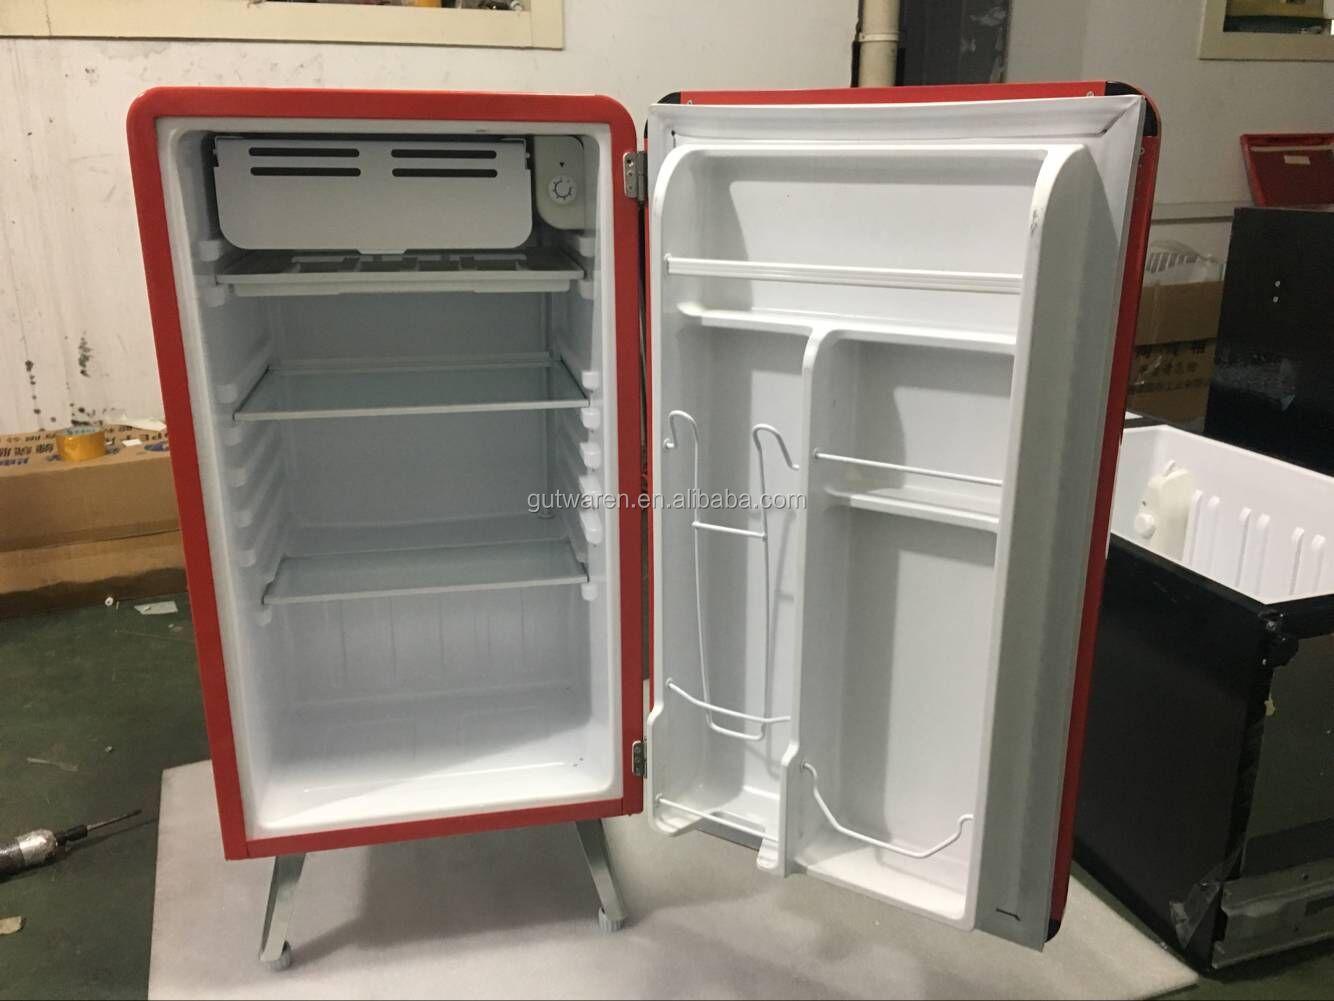 Mini Kühlschrank Retro : Bd antike retro kühlschrank doppel tür mini kühlschrank smeg